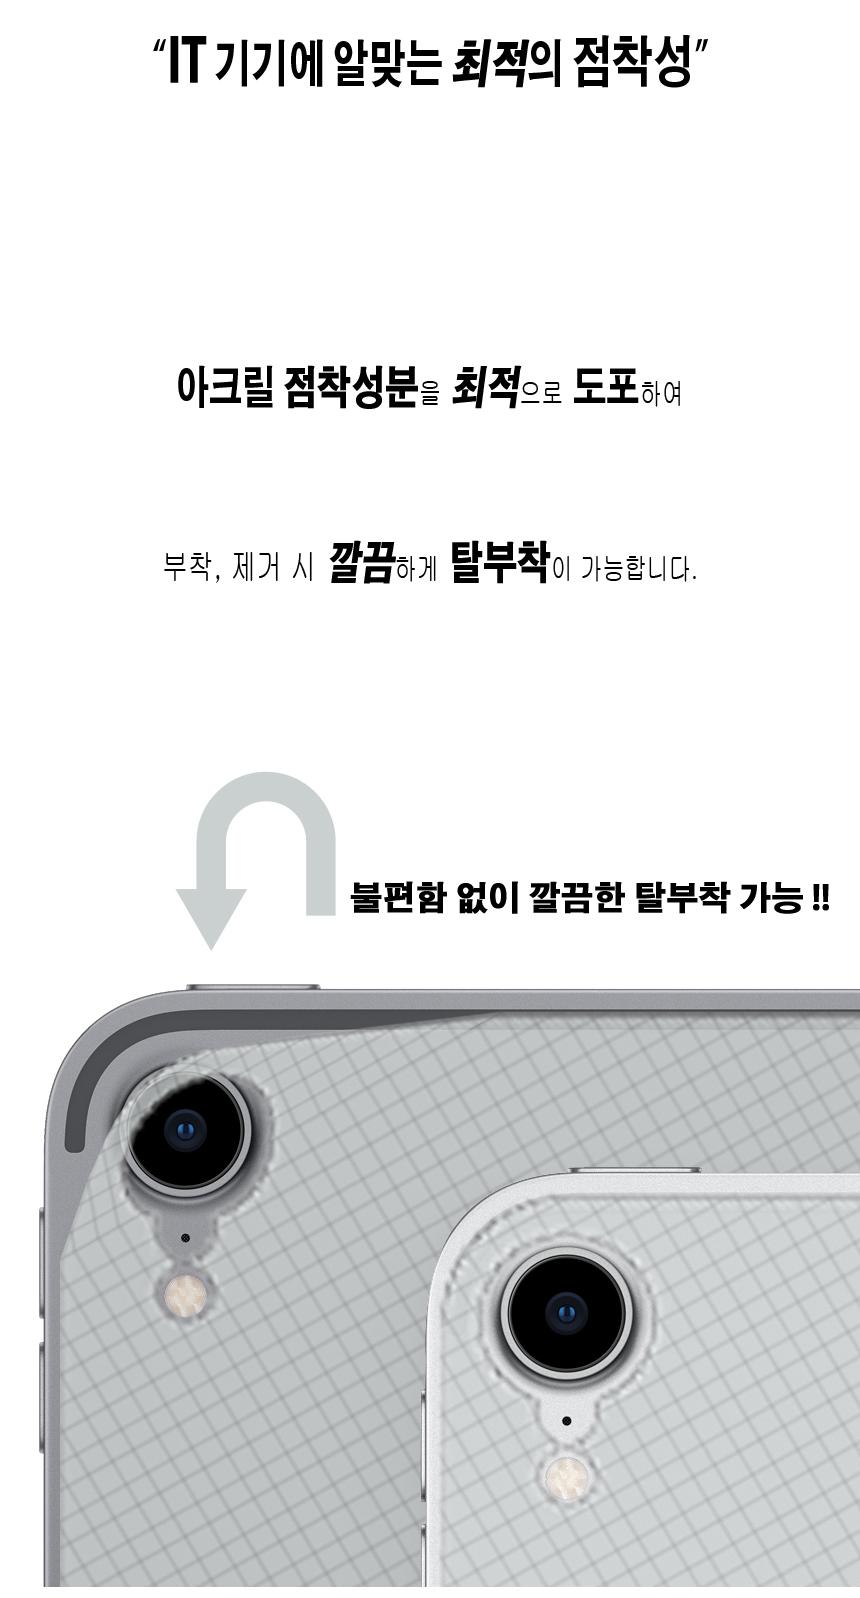 HP파빌리온 X360 DH1150TU 저반사액정+외부필름 - 좀비베리어, 18,300원, 노트북 액정보호필름, 35.56cm~39.62cm